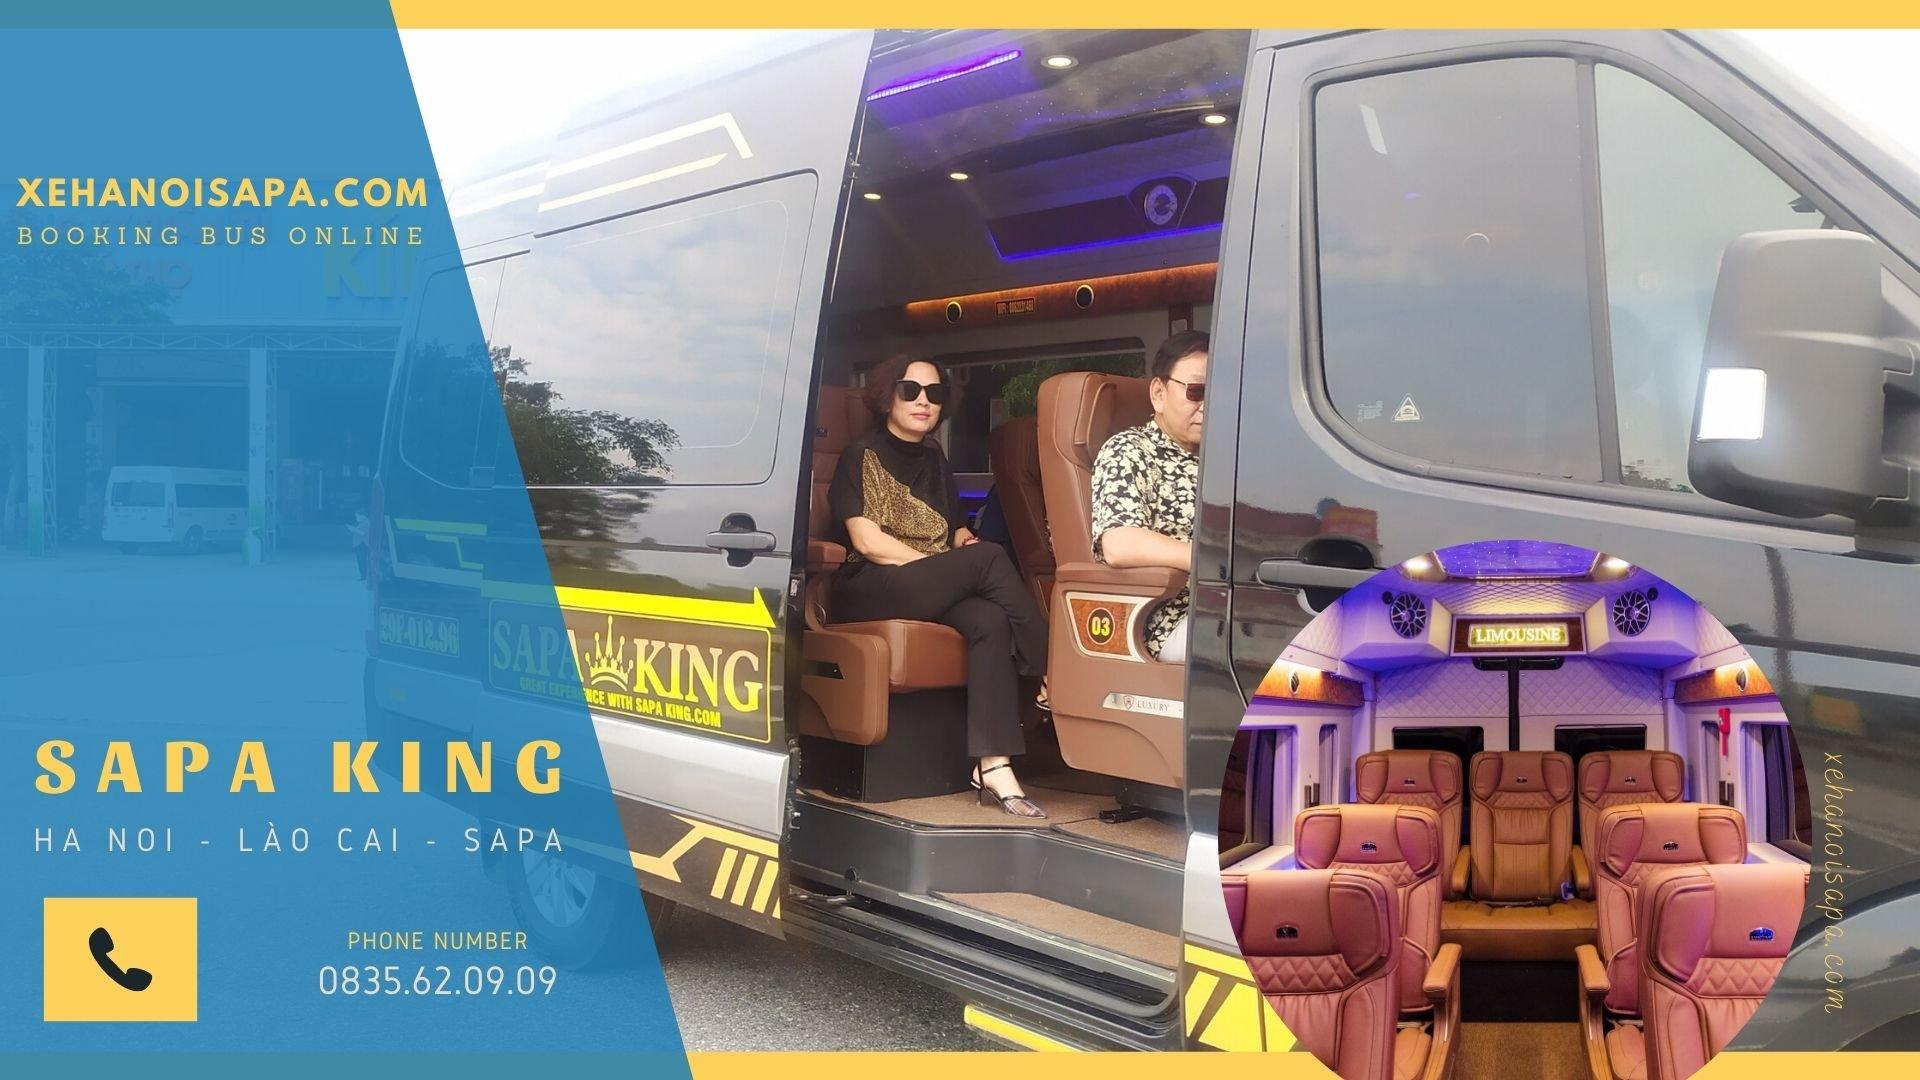 Xe Limousine đi Lào Cai - Hãng xe Sapaking limousine